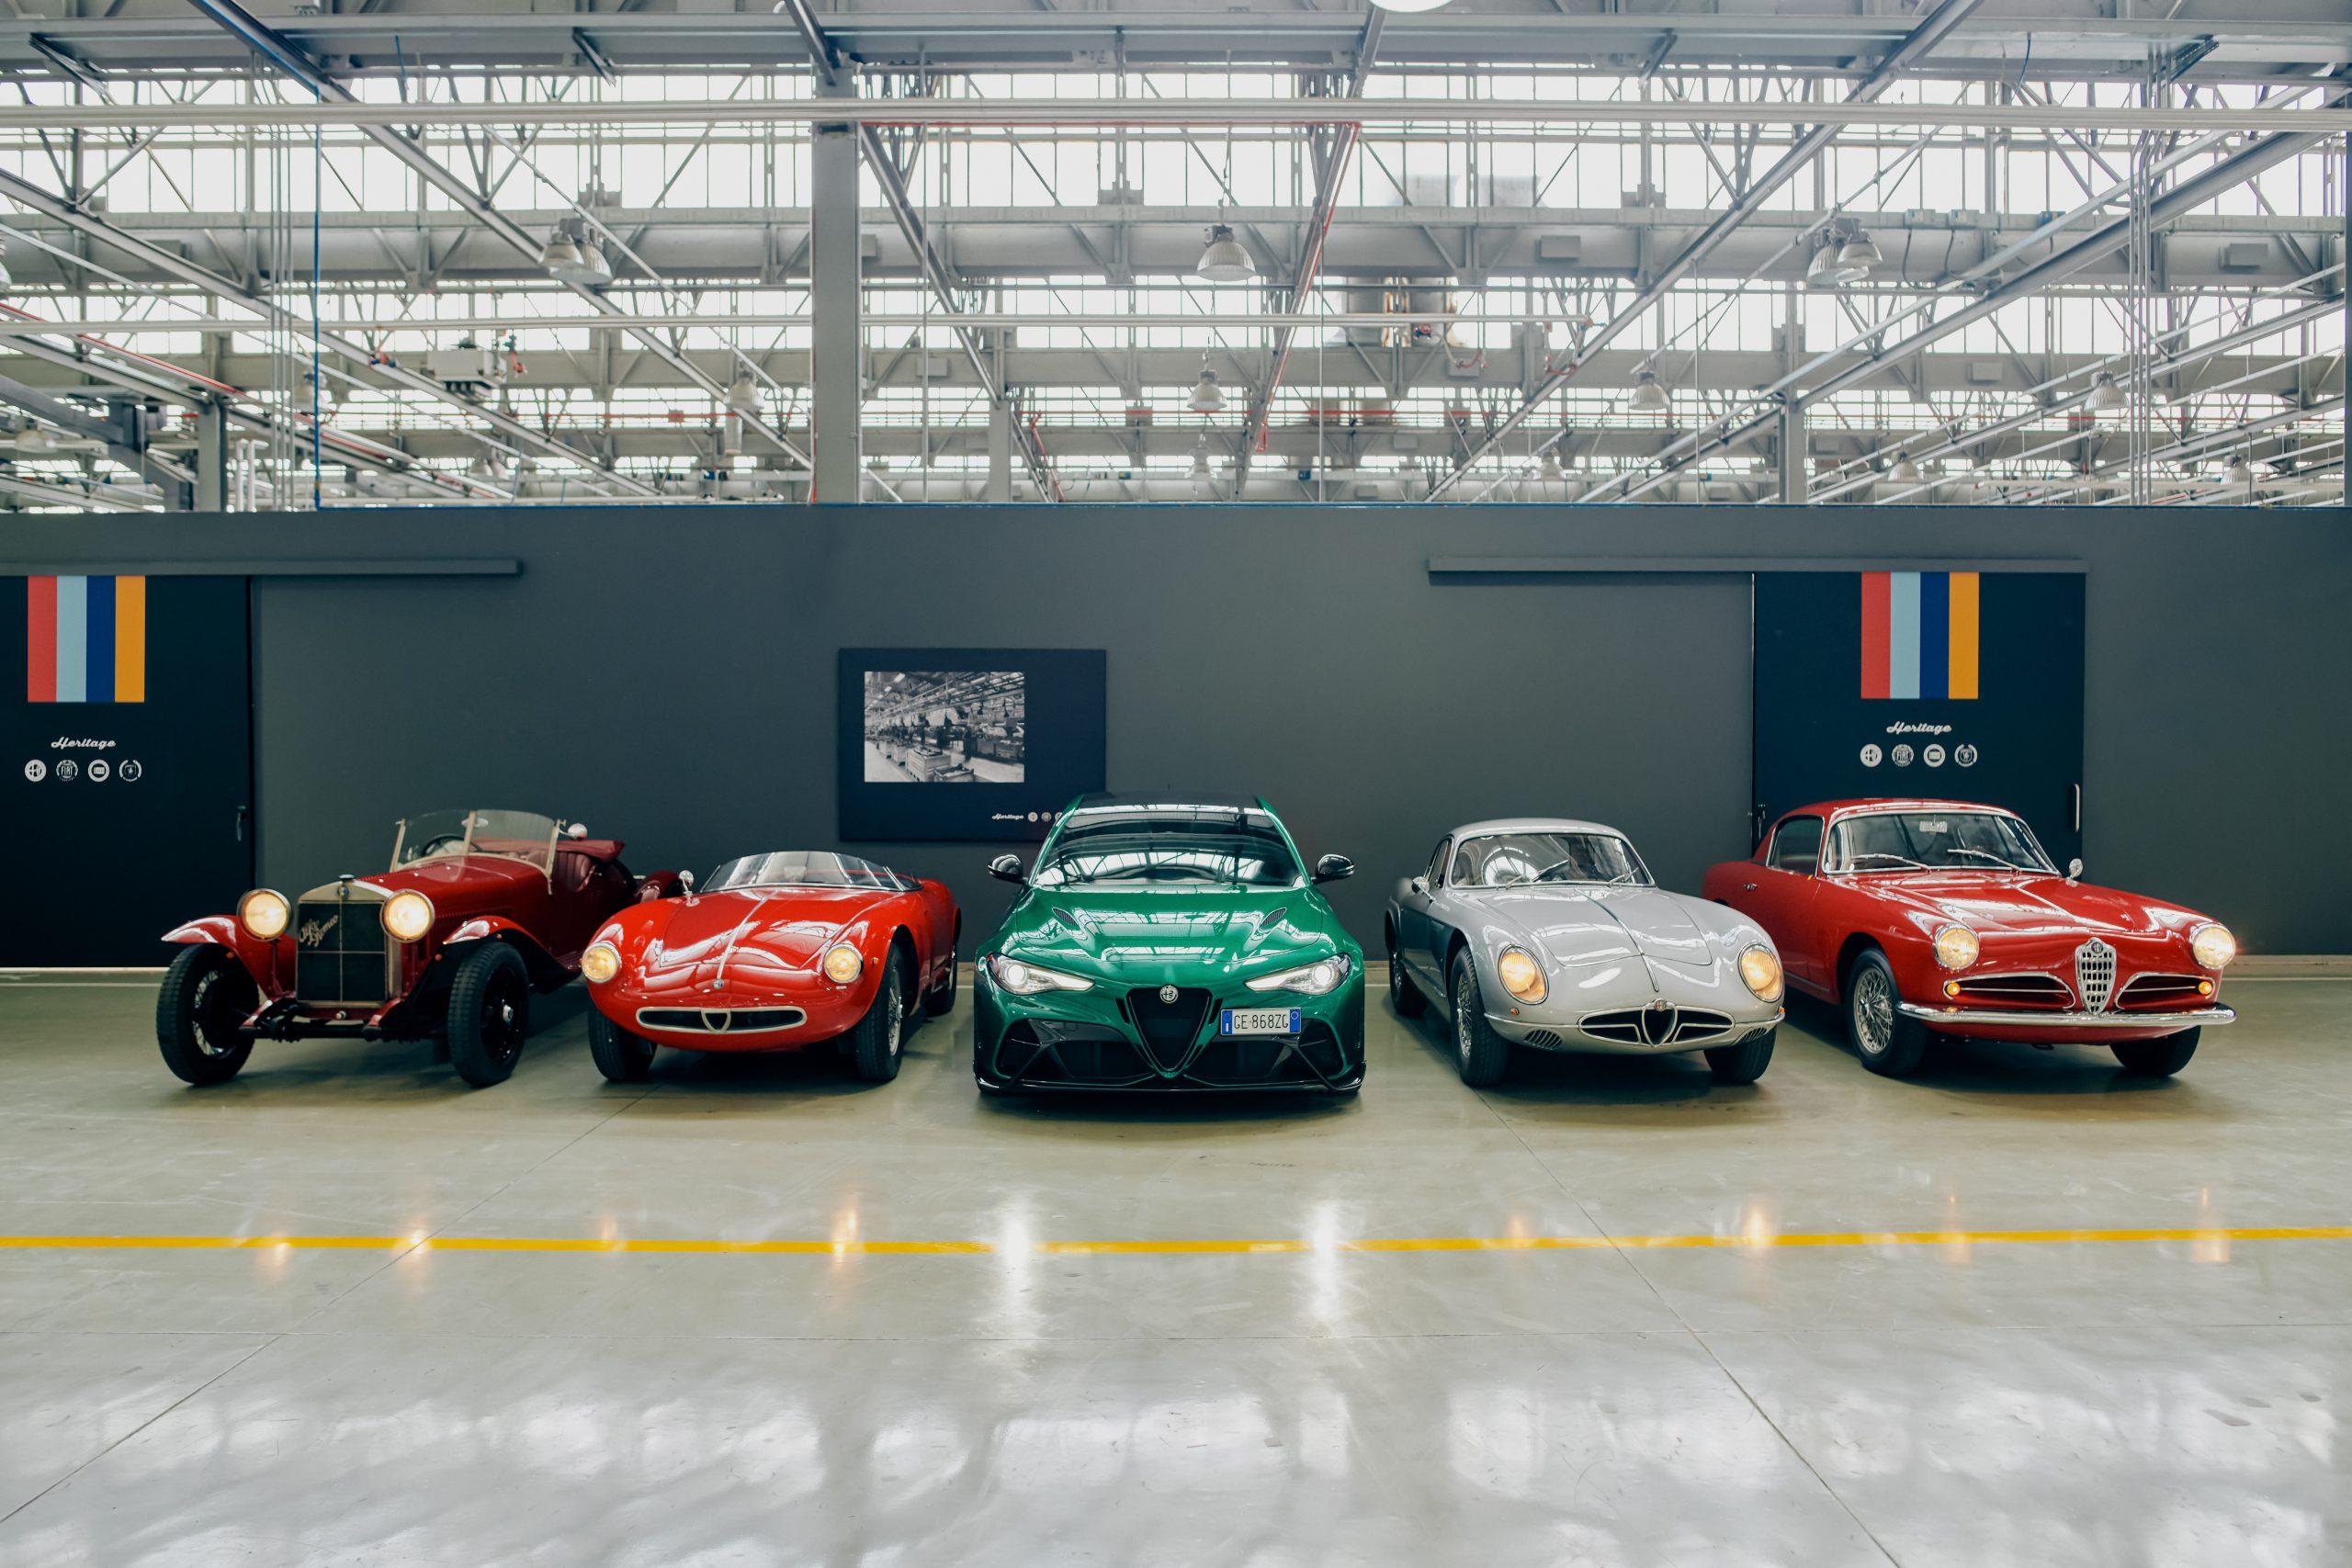 "03 Alfa Romeo and Heritage at the 2021 1000 Miglia scaled H Alfa Romeo ετοιμάζεται για το 39ο ιστορικό ""1000 Miglia"" 1000 Miglia, Alfa, alfa romeo, Alfa Romeo Giulia, Alfa Romeo Giulia GTA, Alfa Romeo Giulia GTAm, Giulia, Mille Miglia, zblog, ειδήσεις, Νέα"